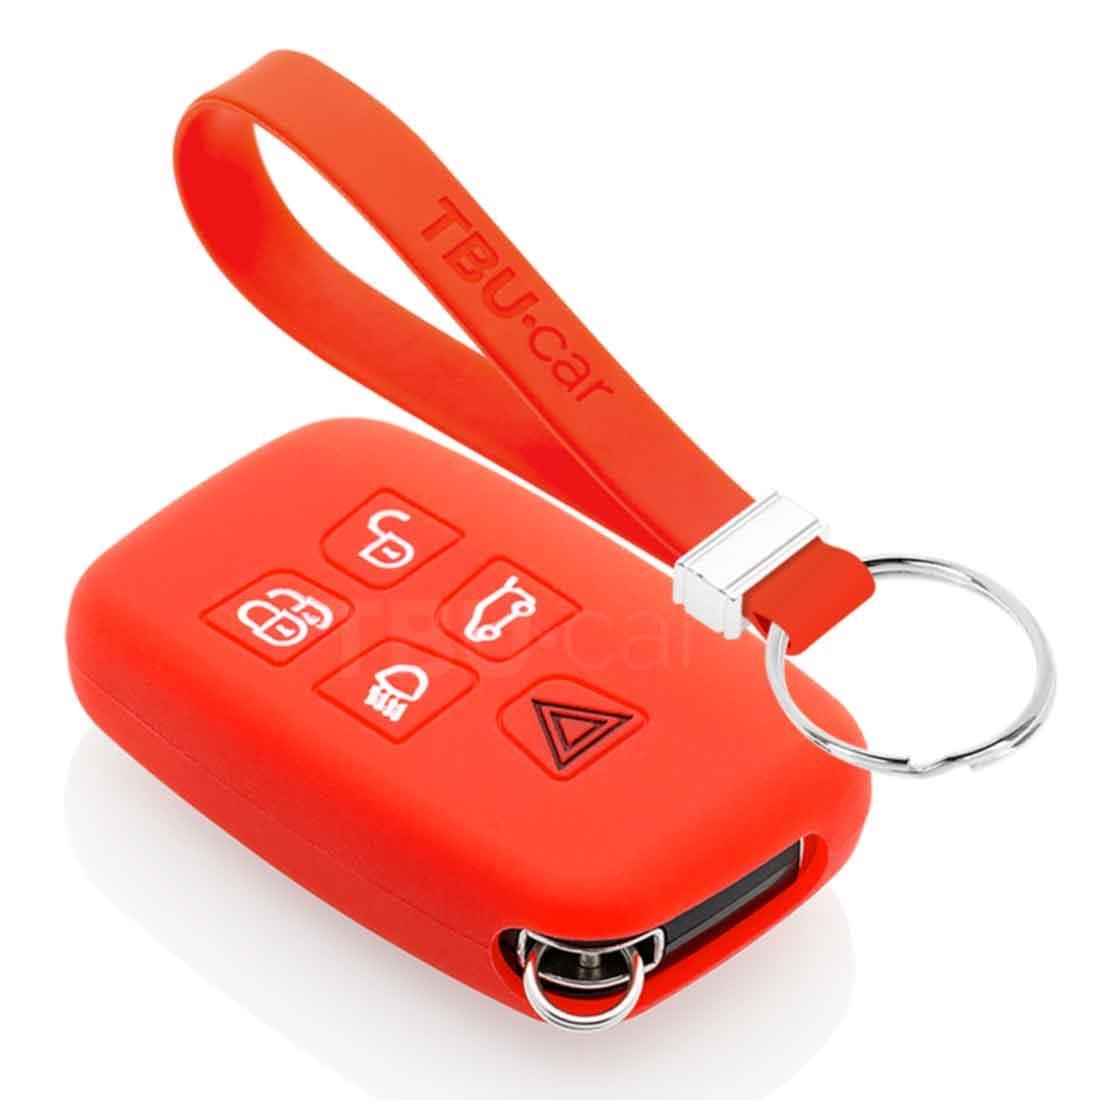 TBU car TBU car Sleutel cover compatibel met Range Rover - Silicone sleutelhoesje - beschermhoesje autosleutel - Rood